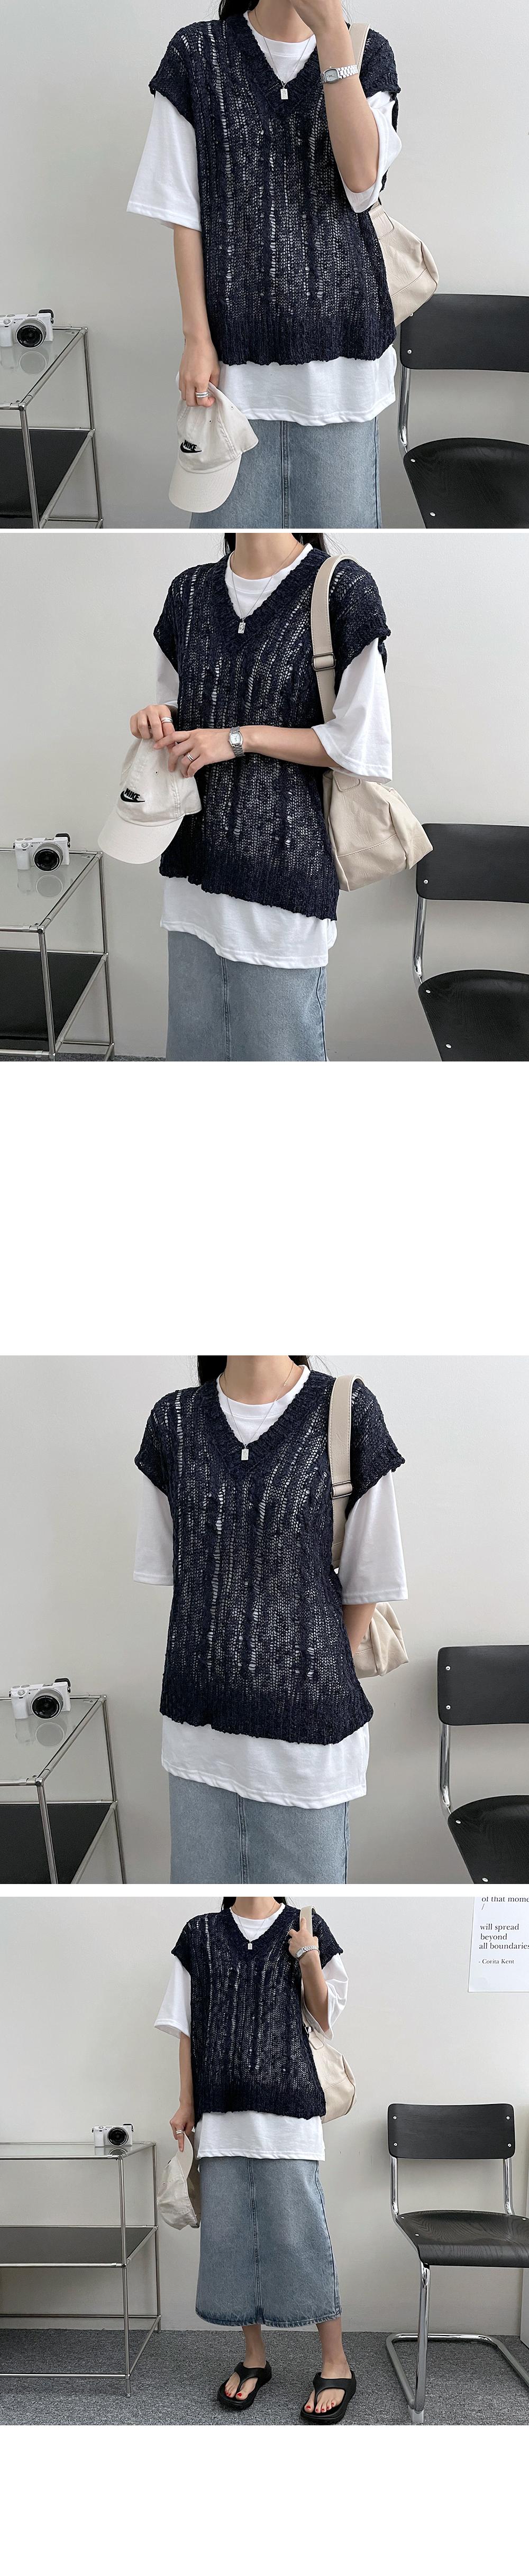 Slob Bookle Twisted Loose Fit Knitwear Vest